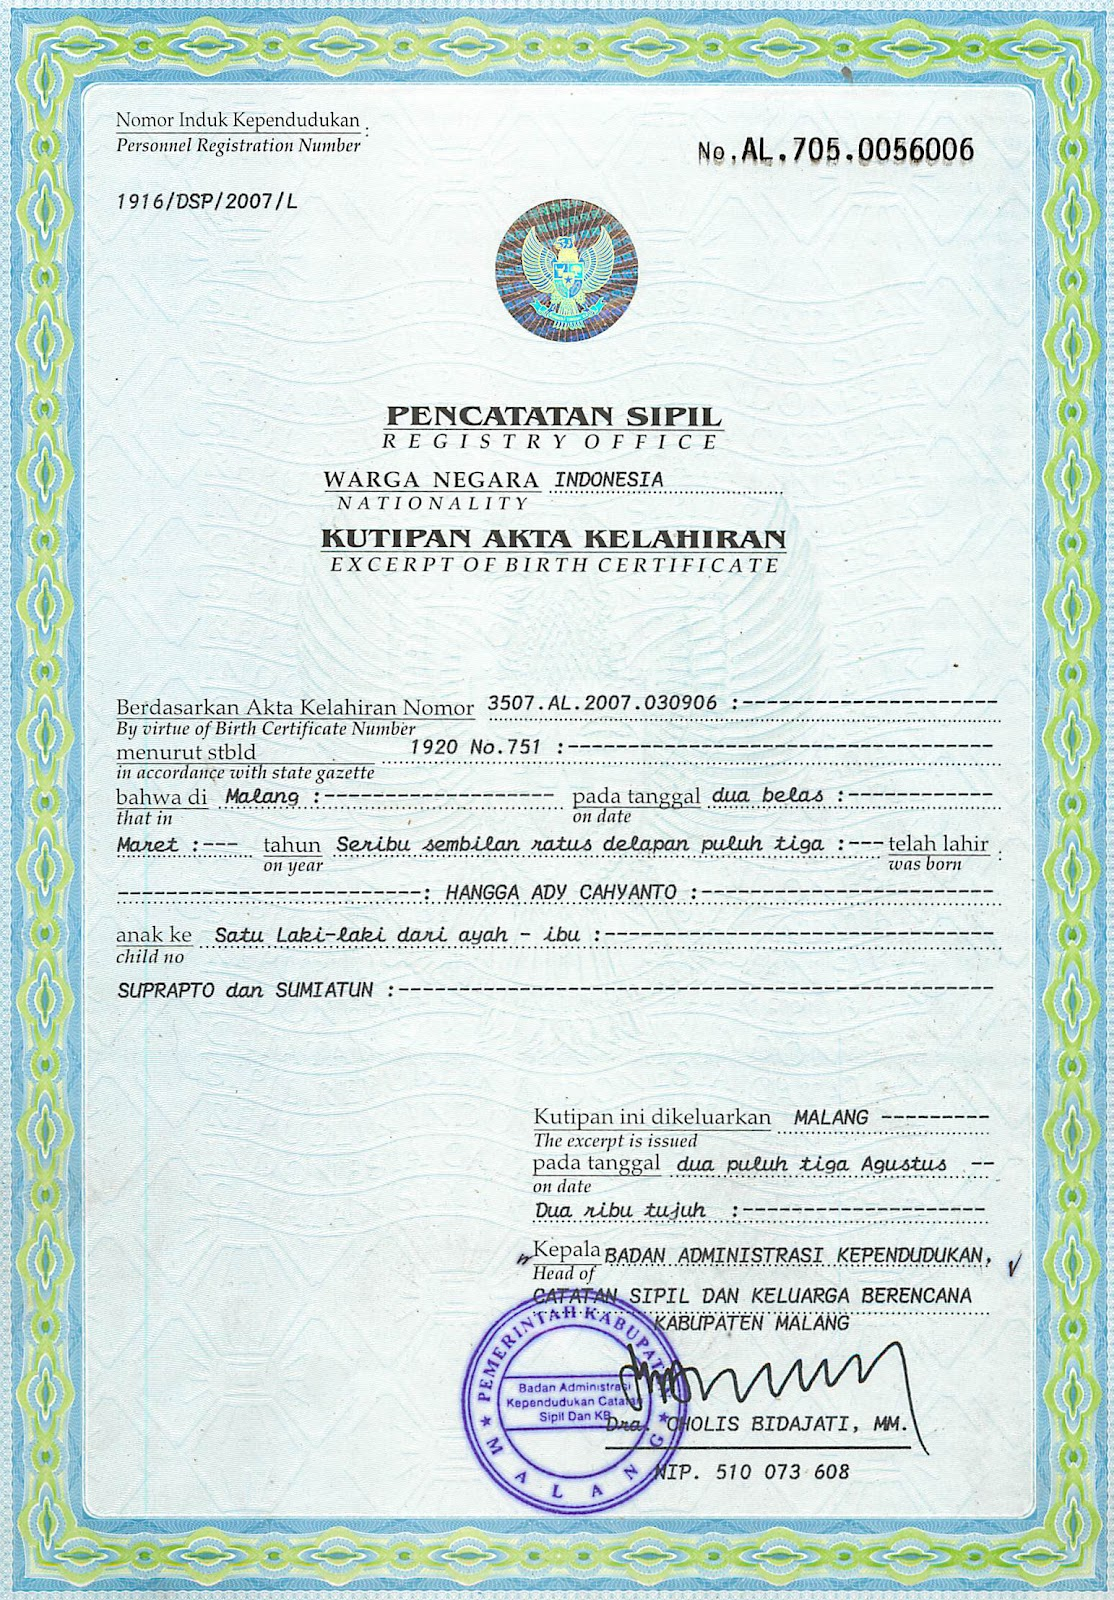 Hangga Ady: Agustus 2012